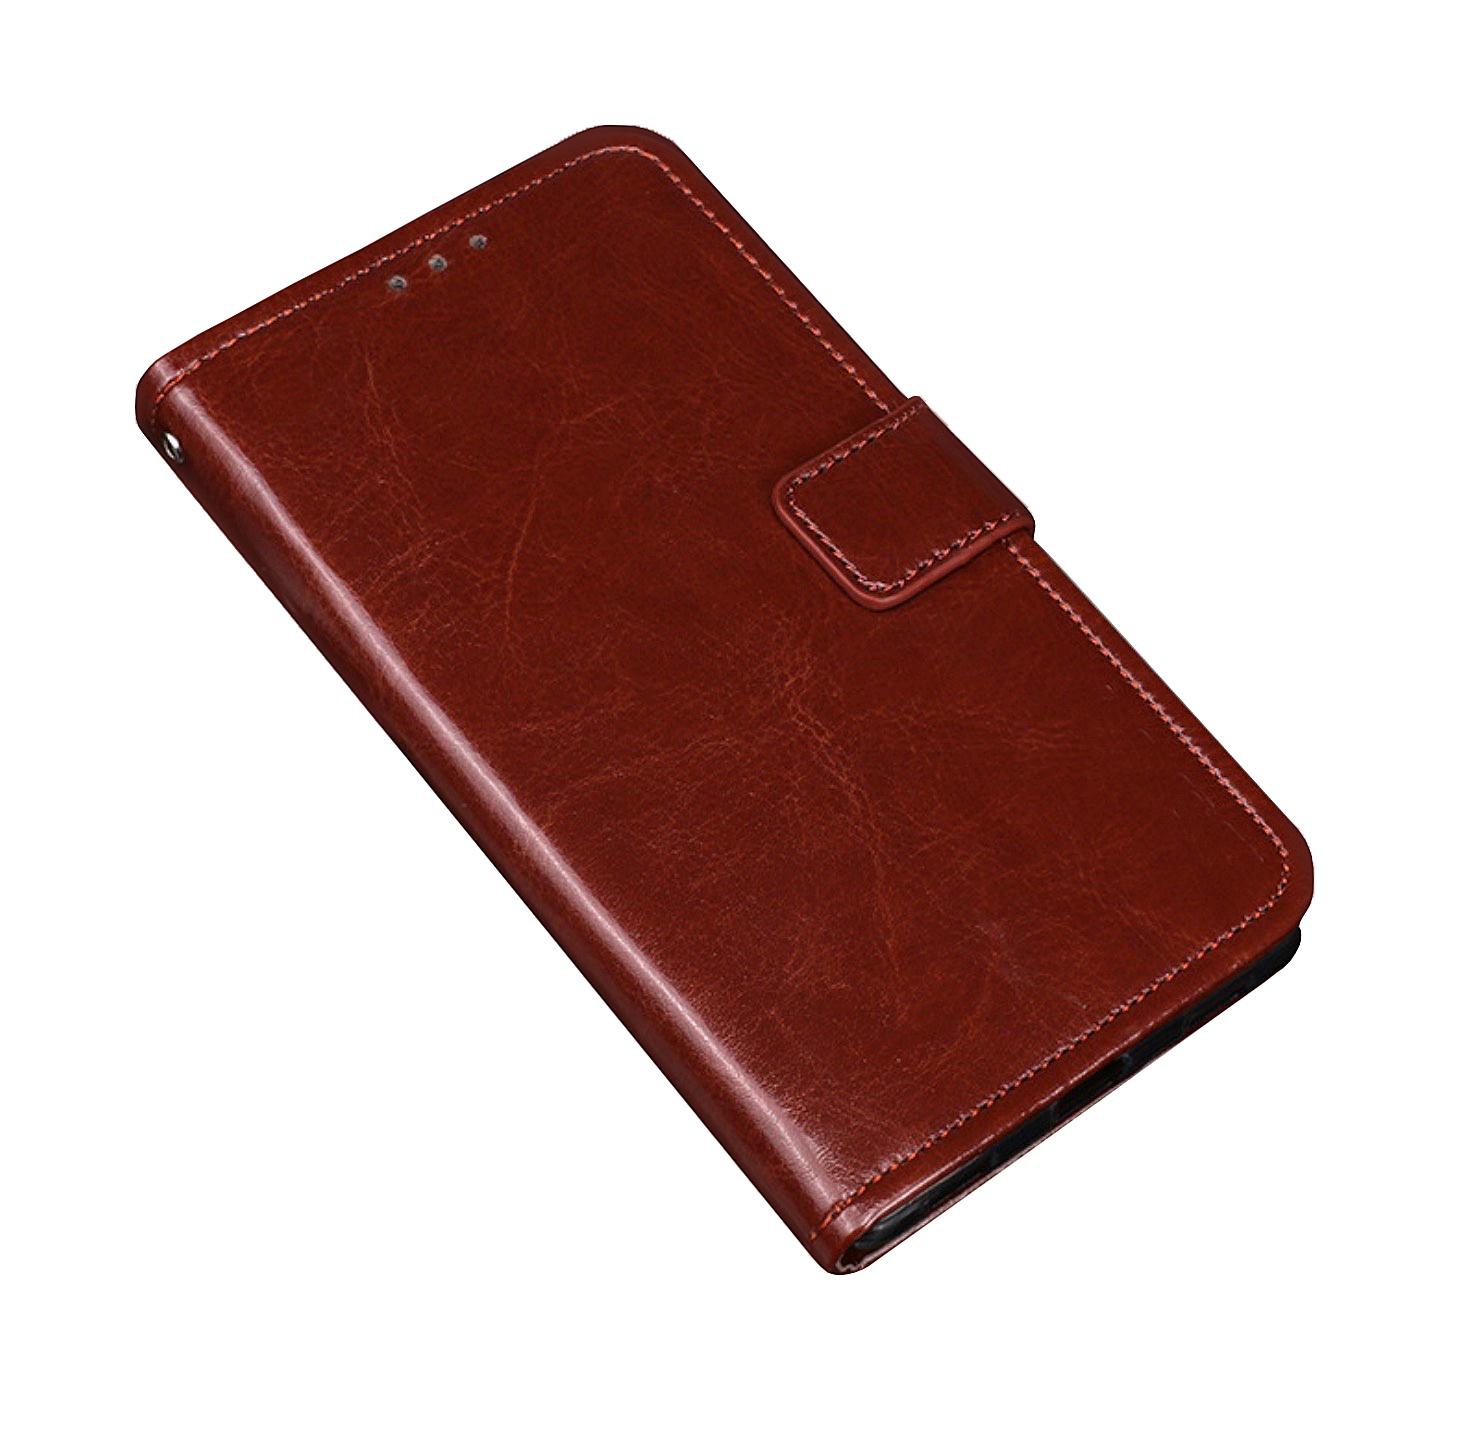 Чехол-книжка MyPads для Huawei Honor 8 Pro 5.7/Huawei Honor V9 5.7(DUK-AL20) с мульти-подставкой застёжкой и визитницей коричневый